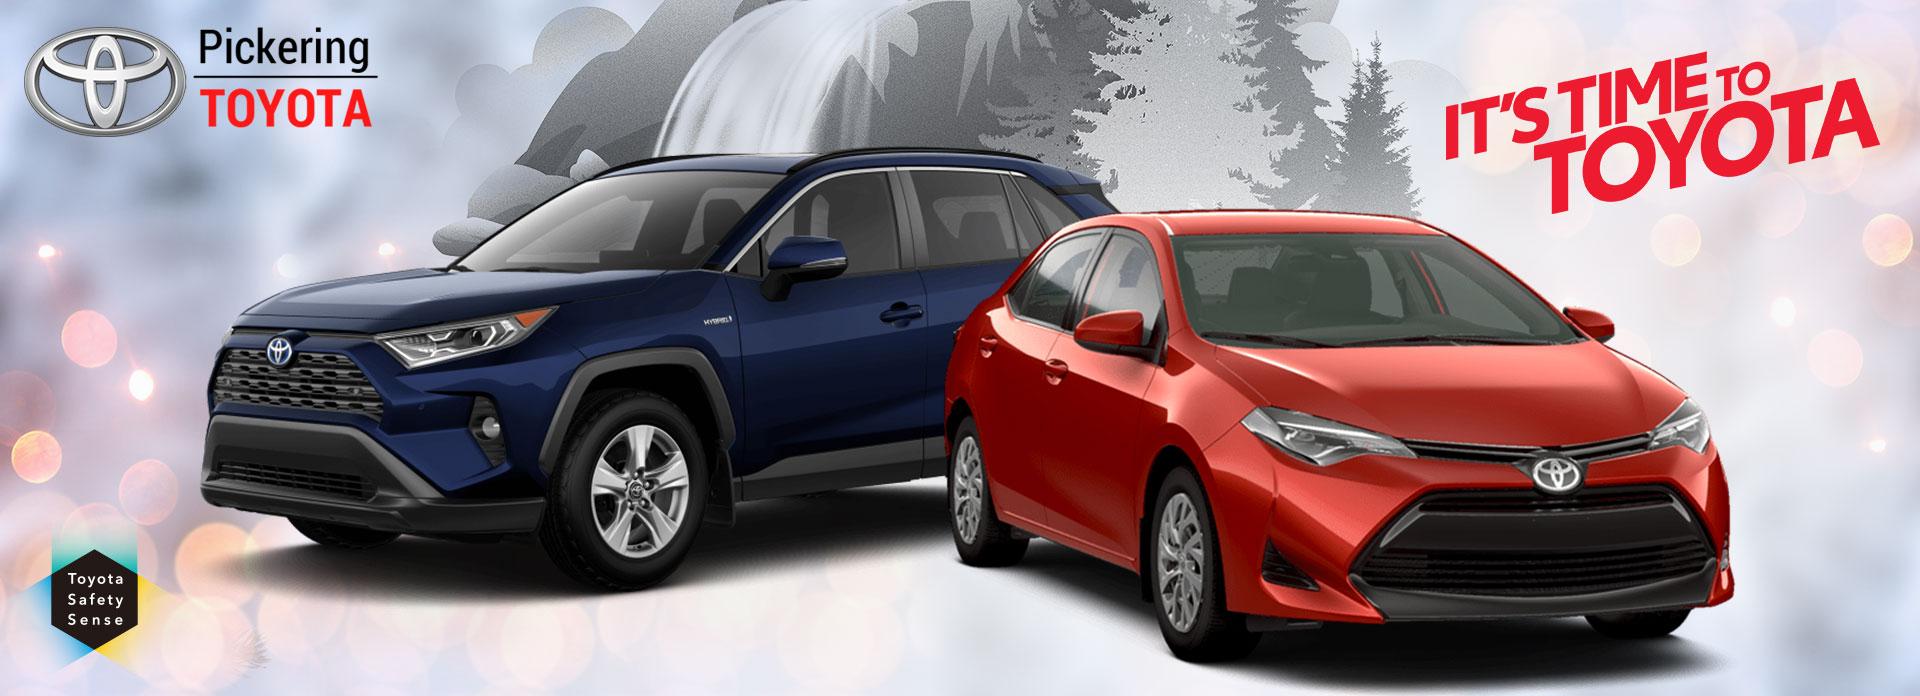 TOYOTA 2019 Get In & Go Event   Pickering Toyota